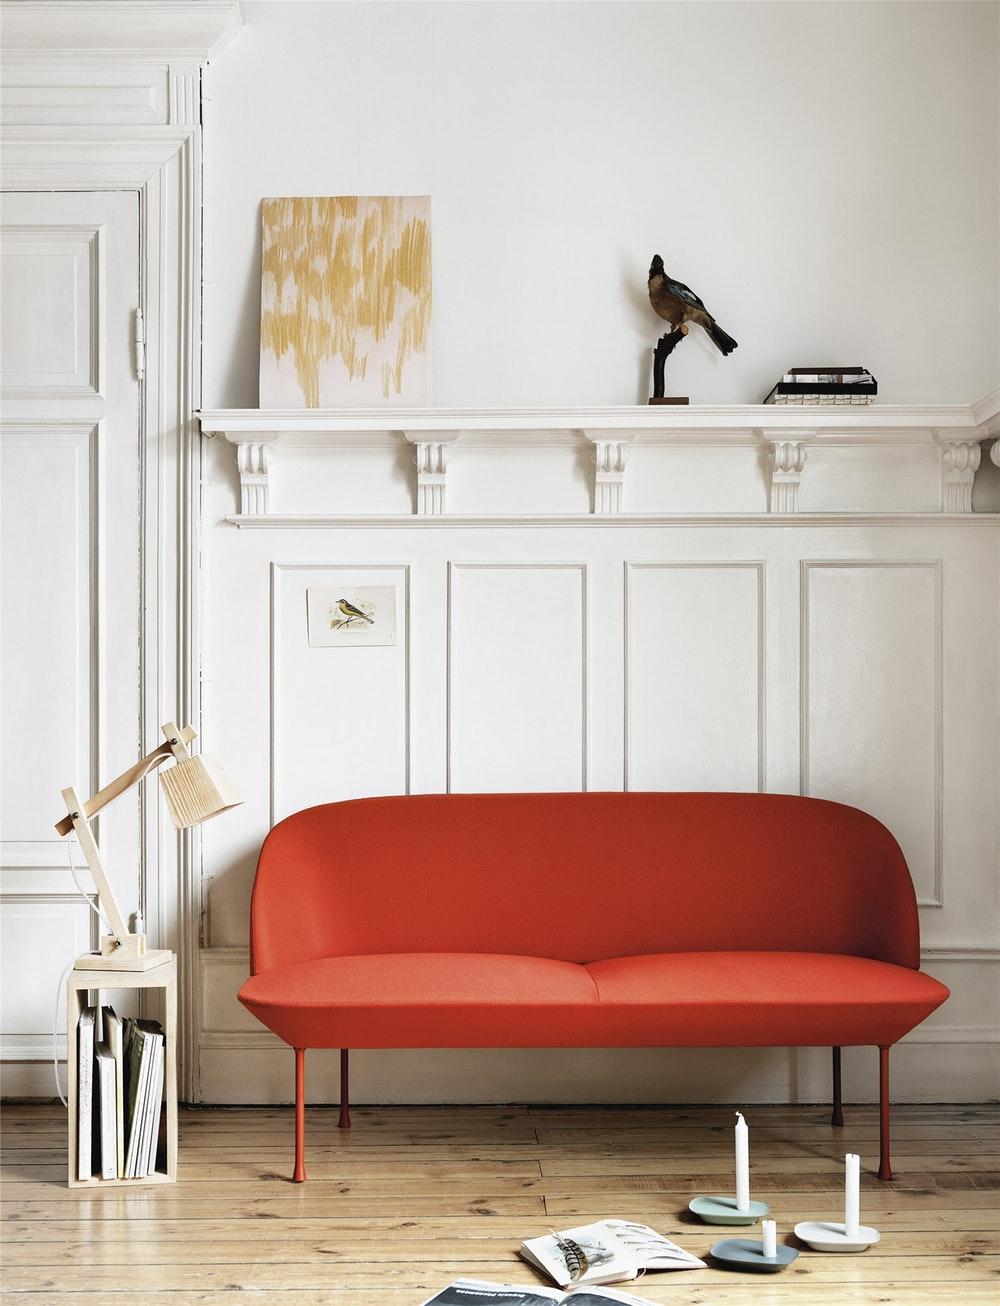 oslo-sofa-woodlamp-focus-med-res-1474268347.jpg